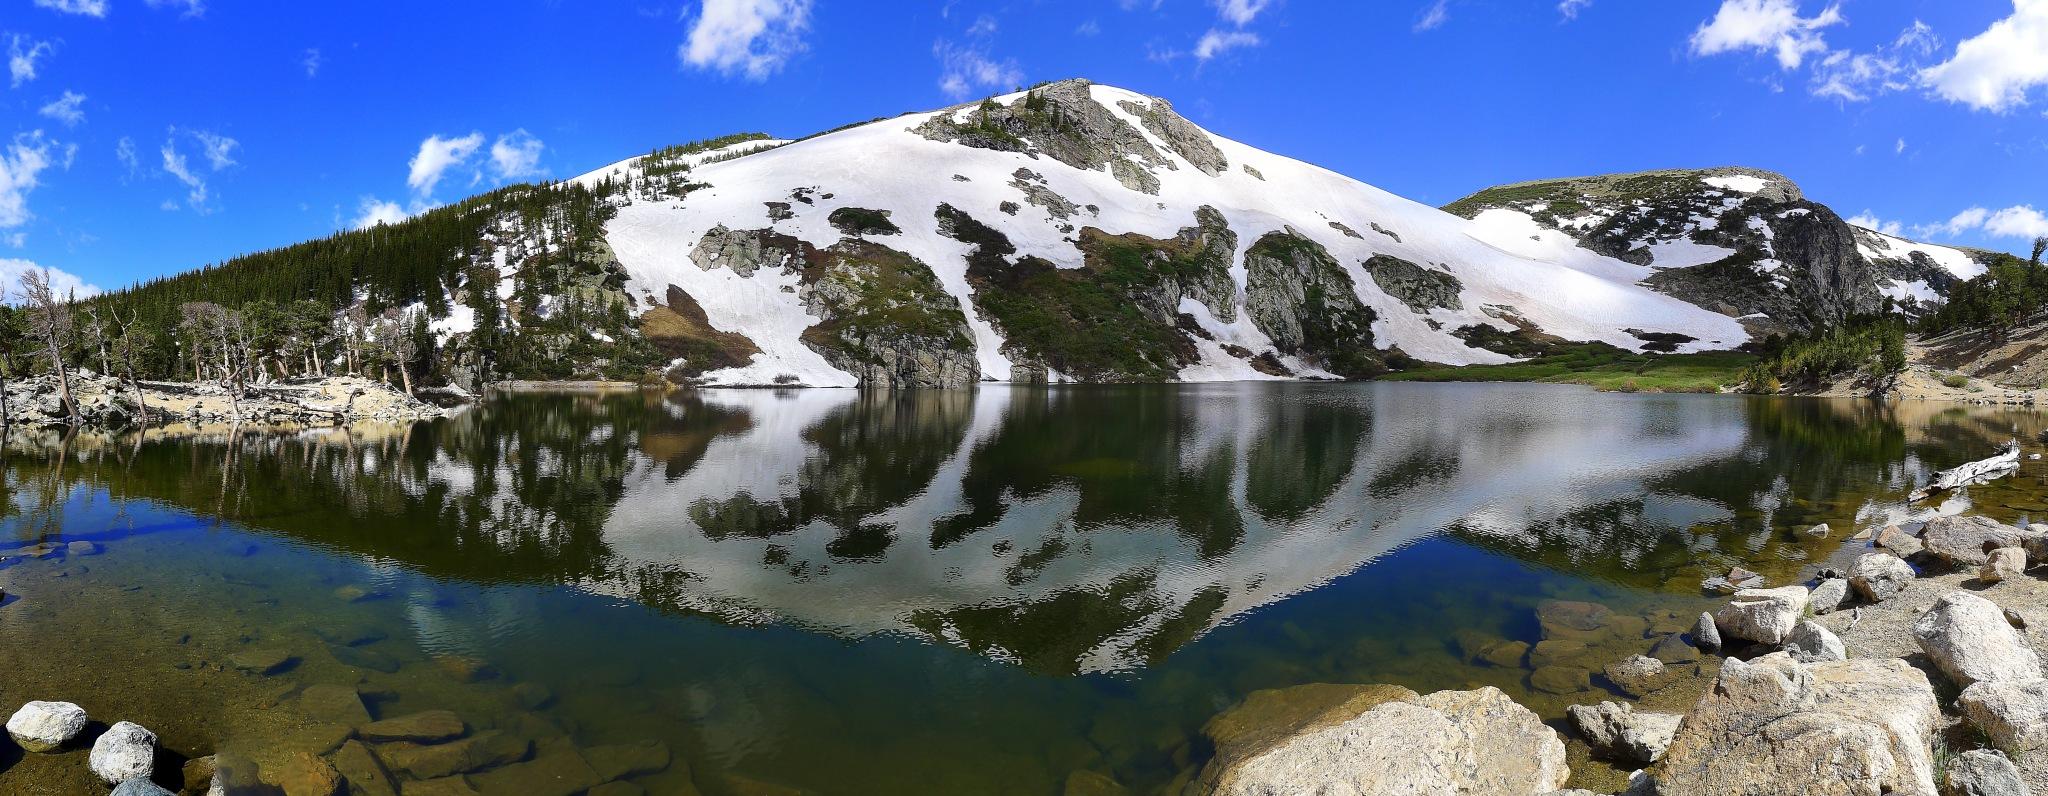 St. Mary's Glacier by sciguylvms